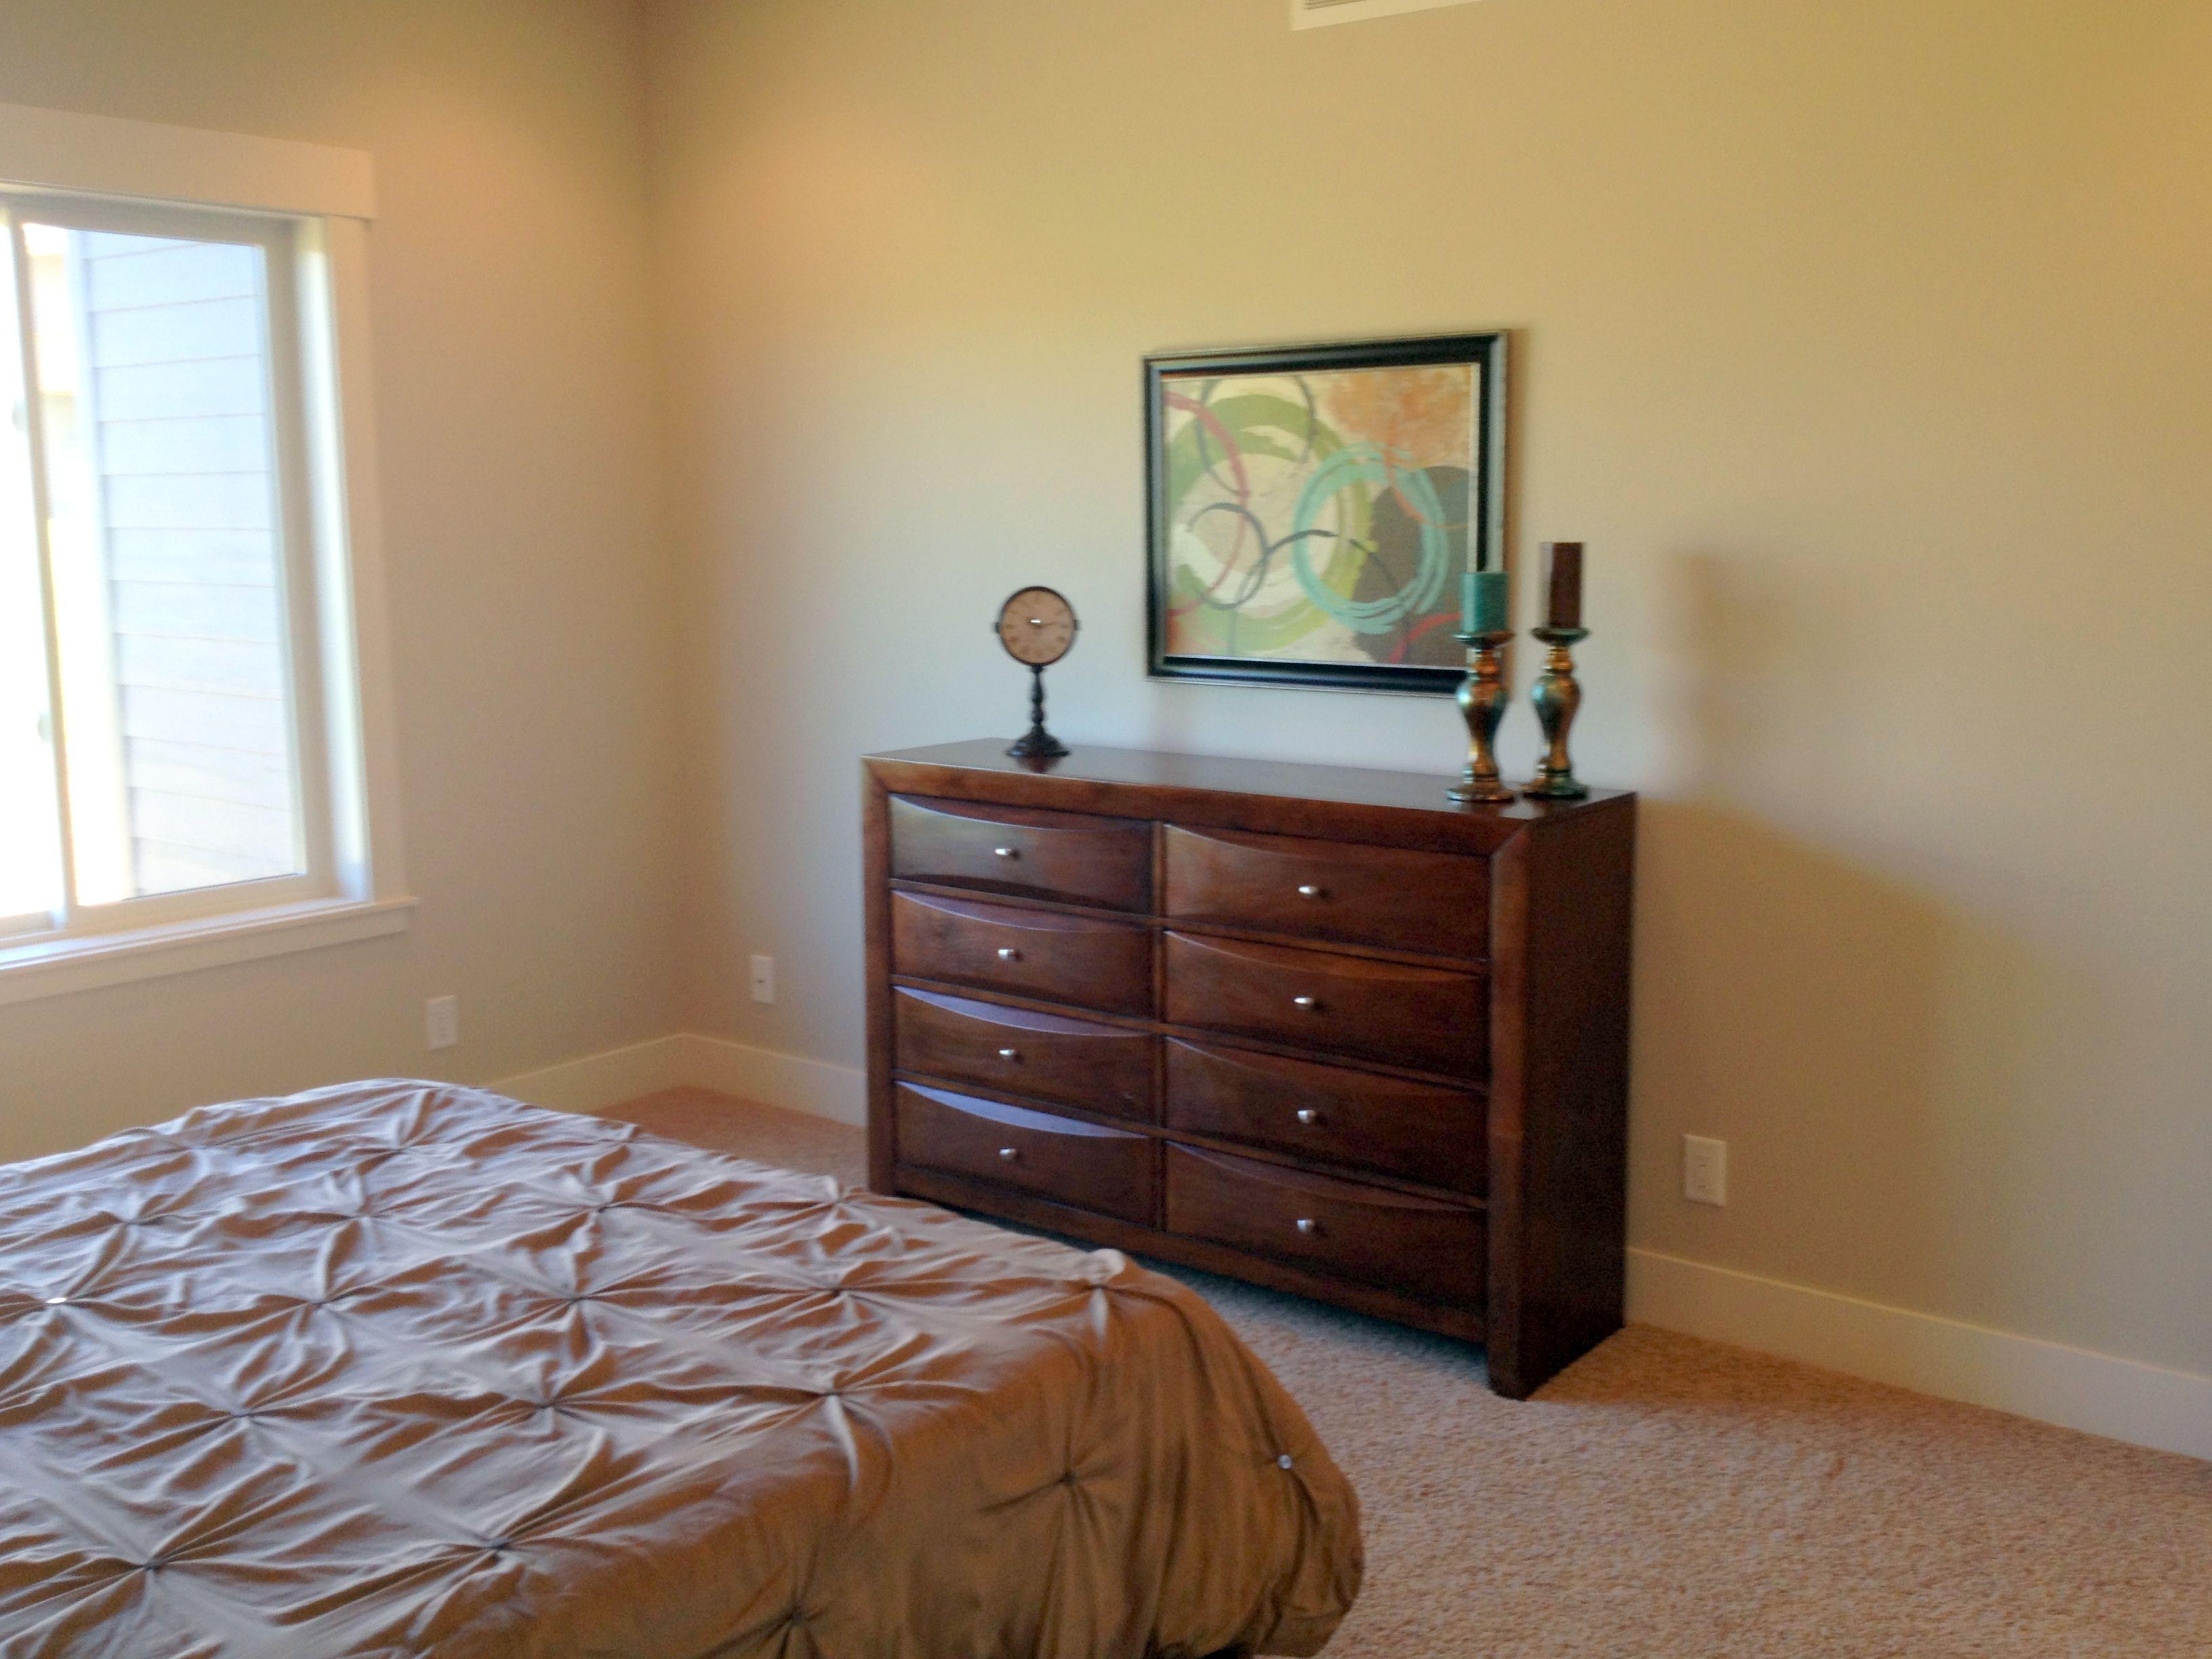 After Staging of Master Bedroom Dresser as nightstand